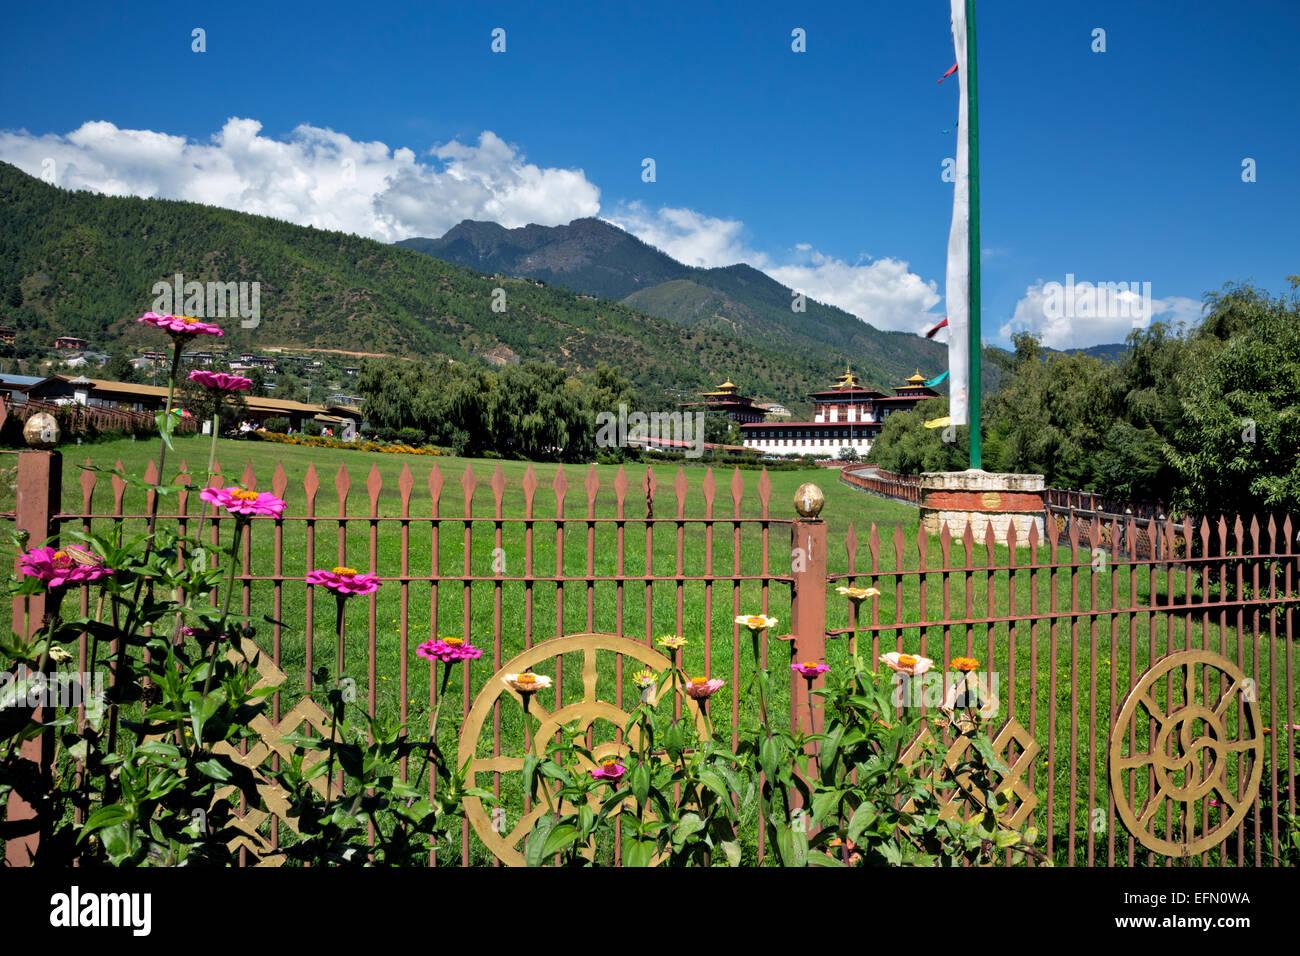 BU00049-00...BHOUTAN -l'Trashi Chhoe Dzong, les principaux édifices gouvernementaux dans la capitale Thimphu. Photo Stock